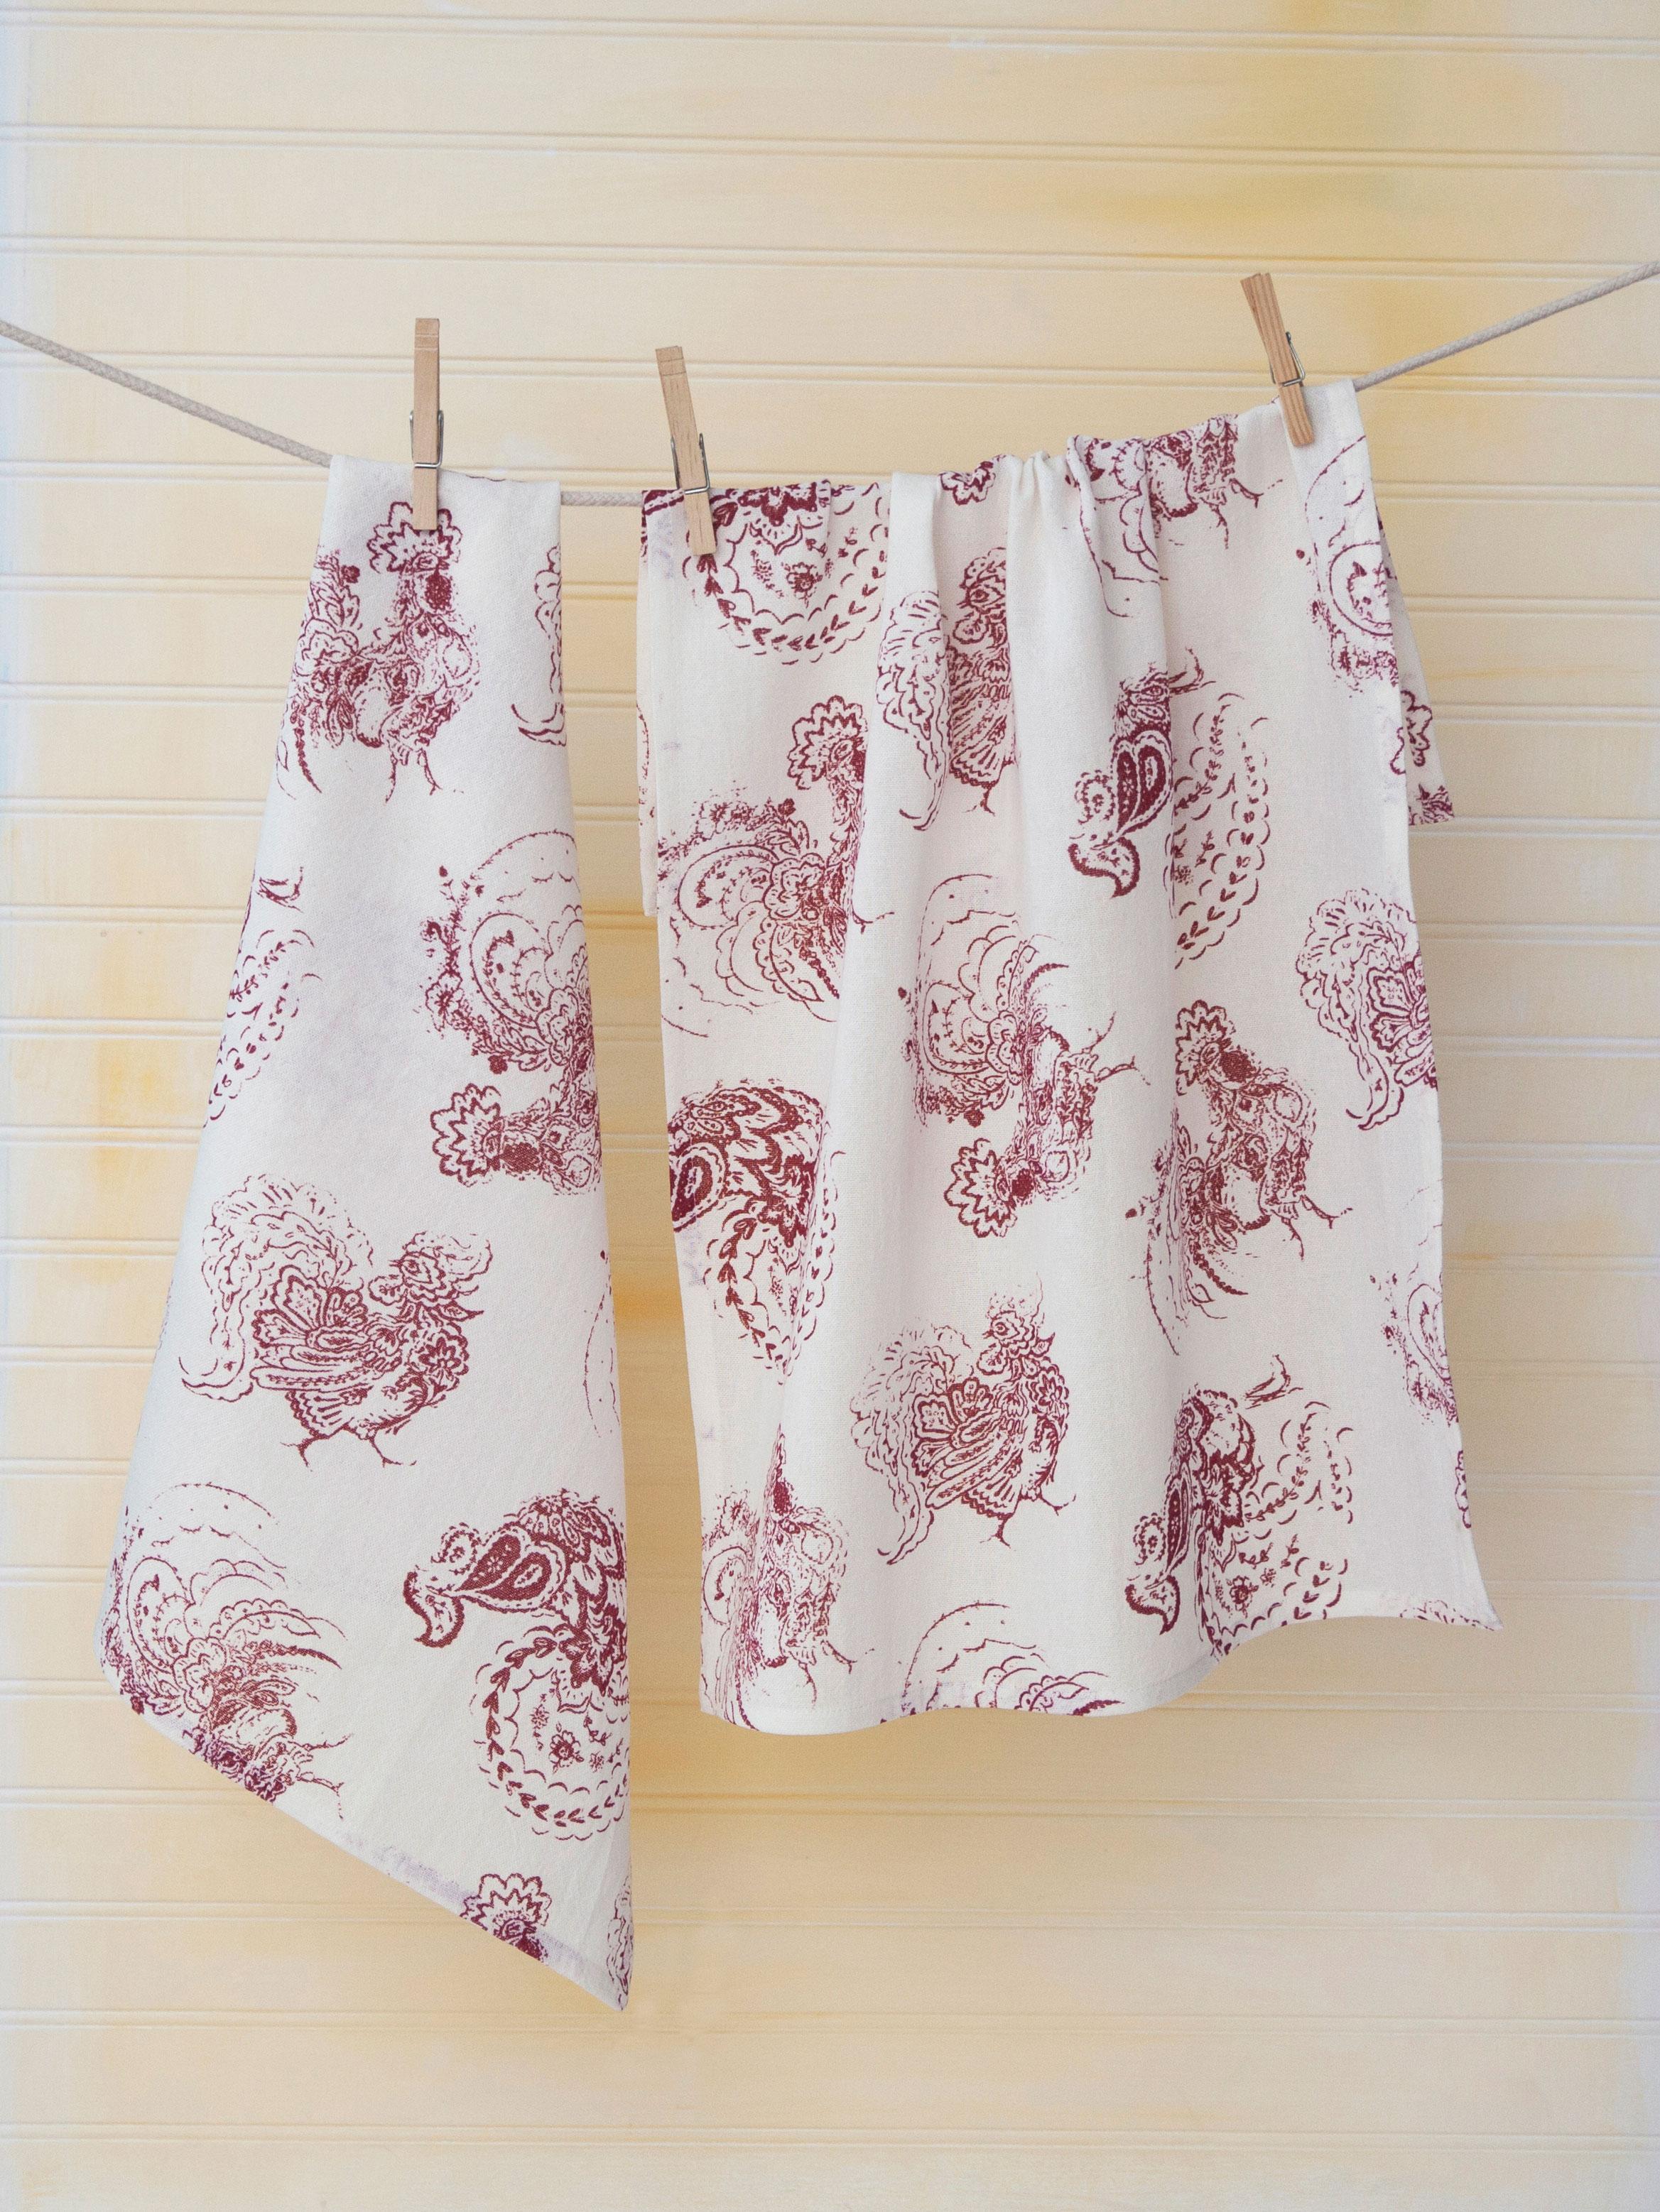 Backyard Rooster Tea Towel | Attic Sale, Linens & Kitchen Attic ...